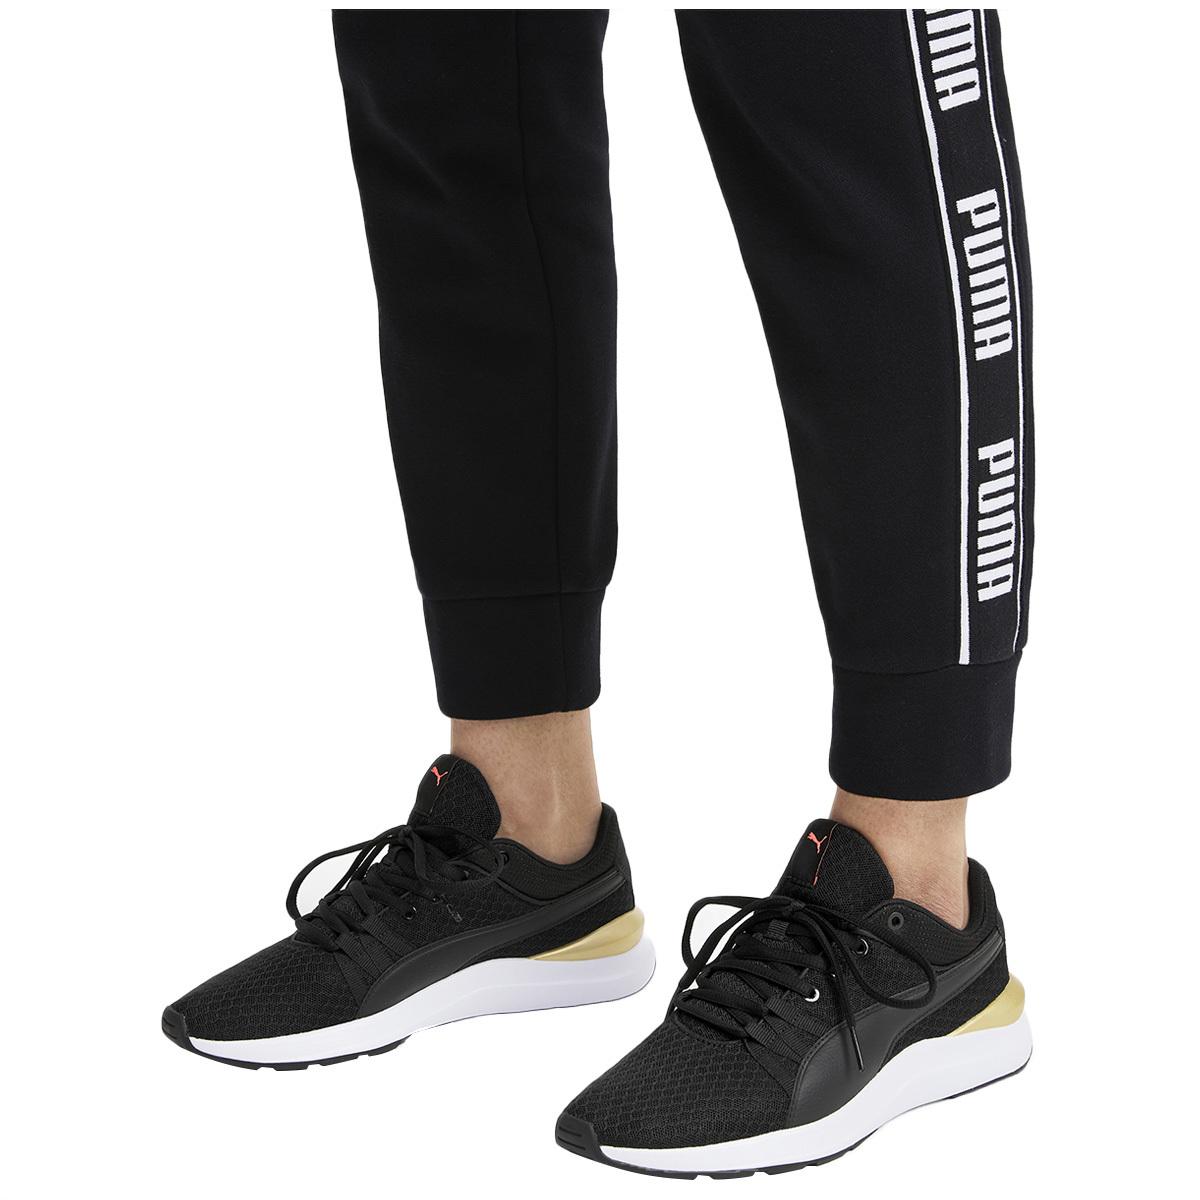 Puma Women's Adela Shoes | Costco Australia